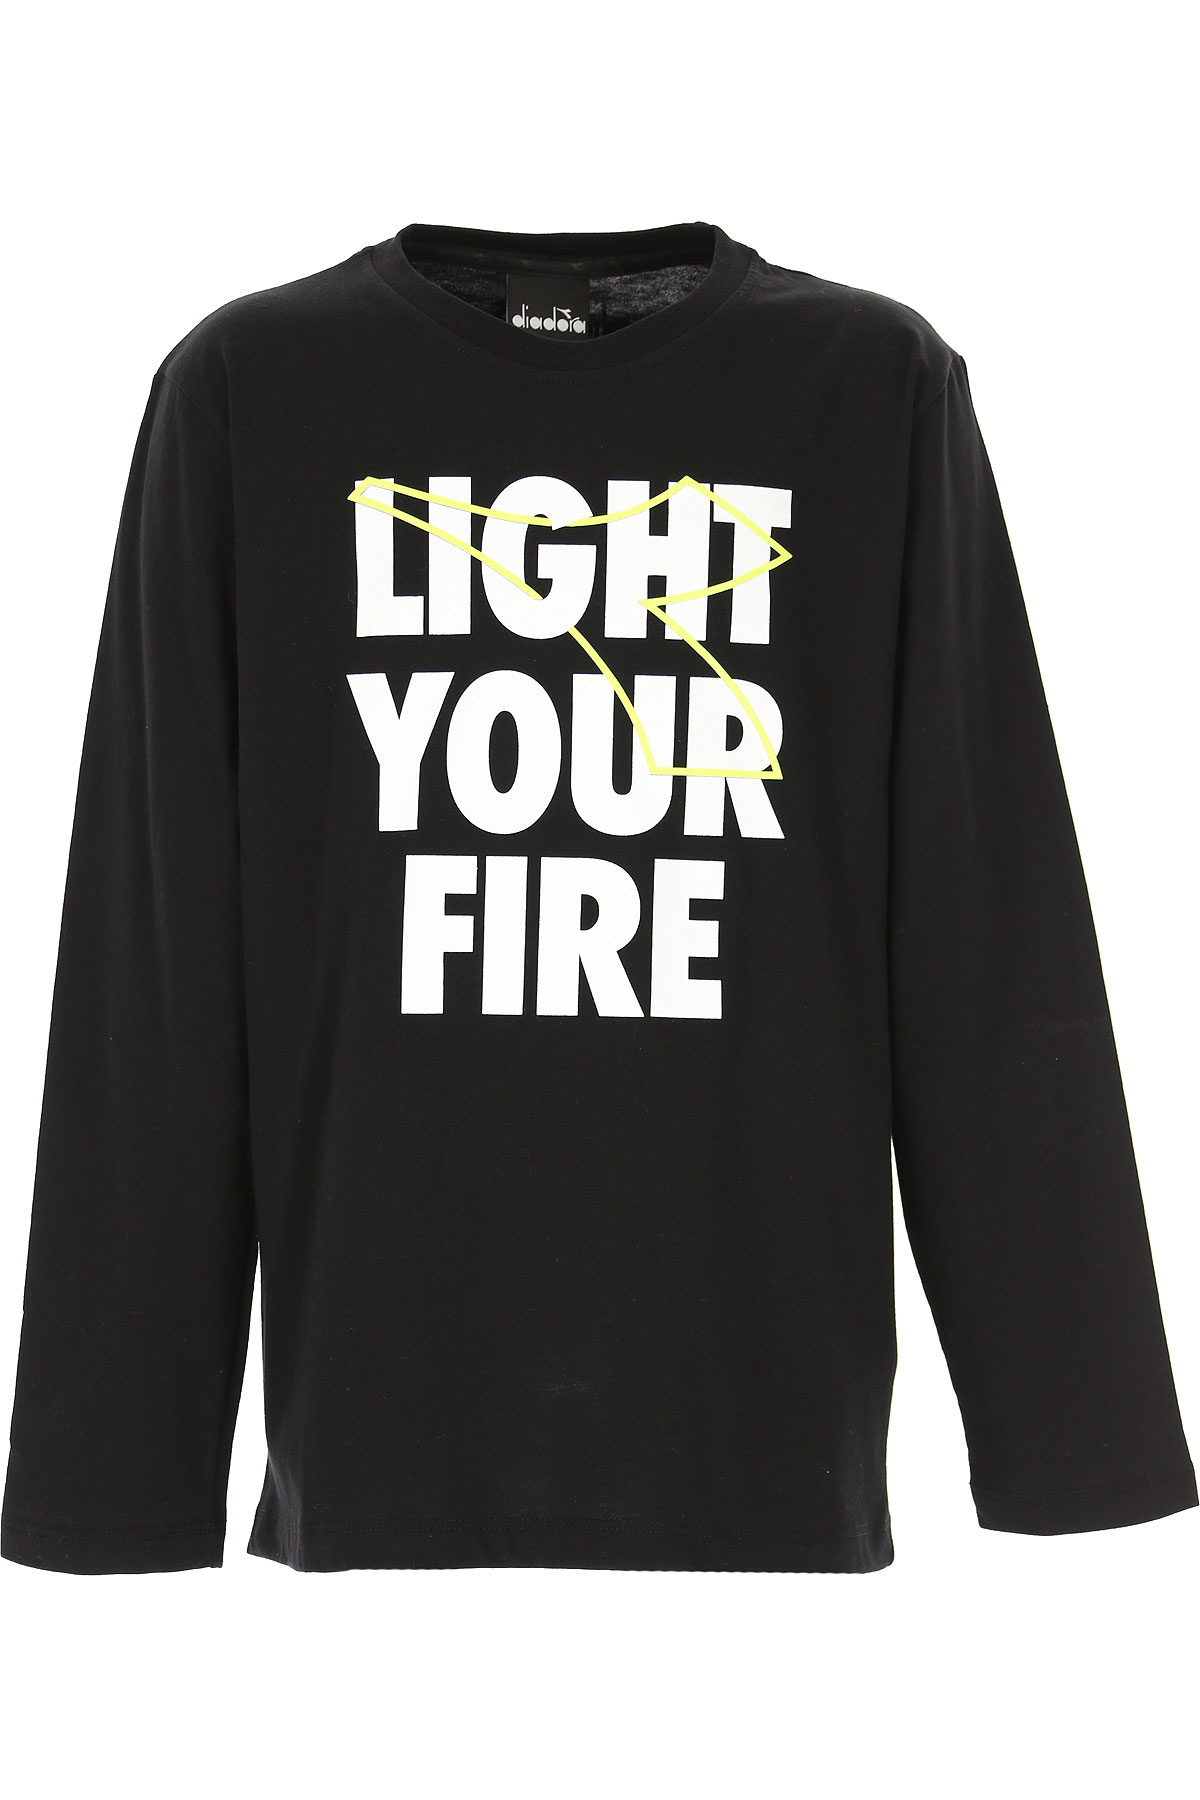 Diadora Kids T-Shirt for Boys On Sale, Black, Cotton, 2019, 12Y 14Y